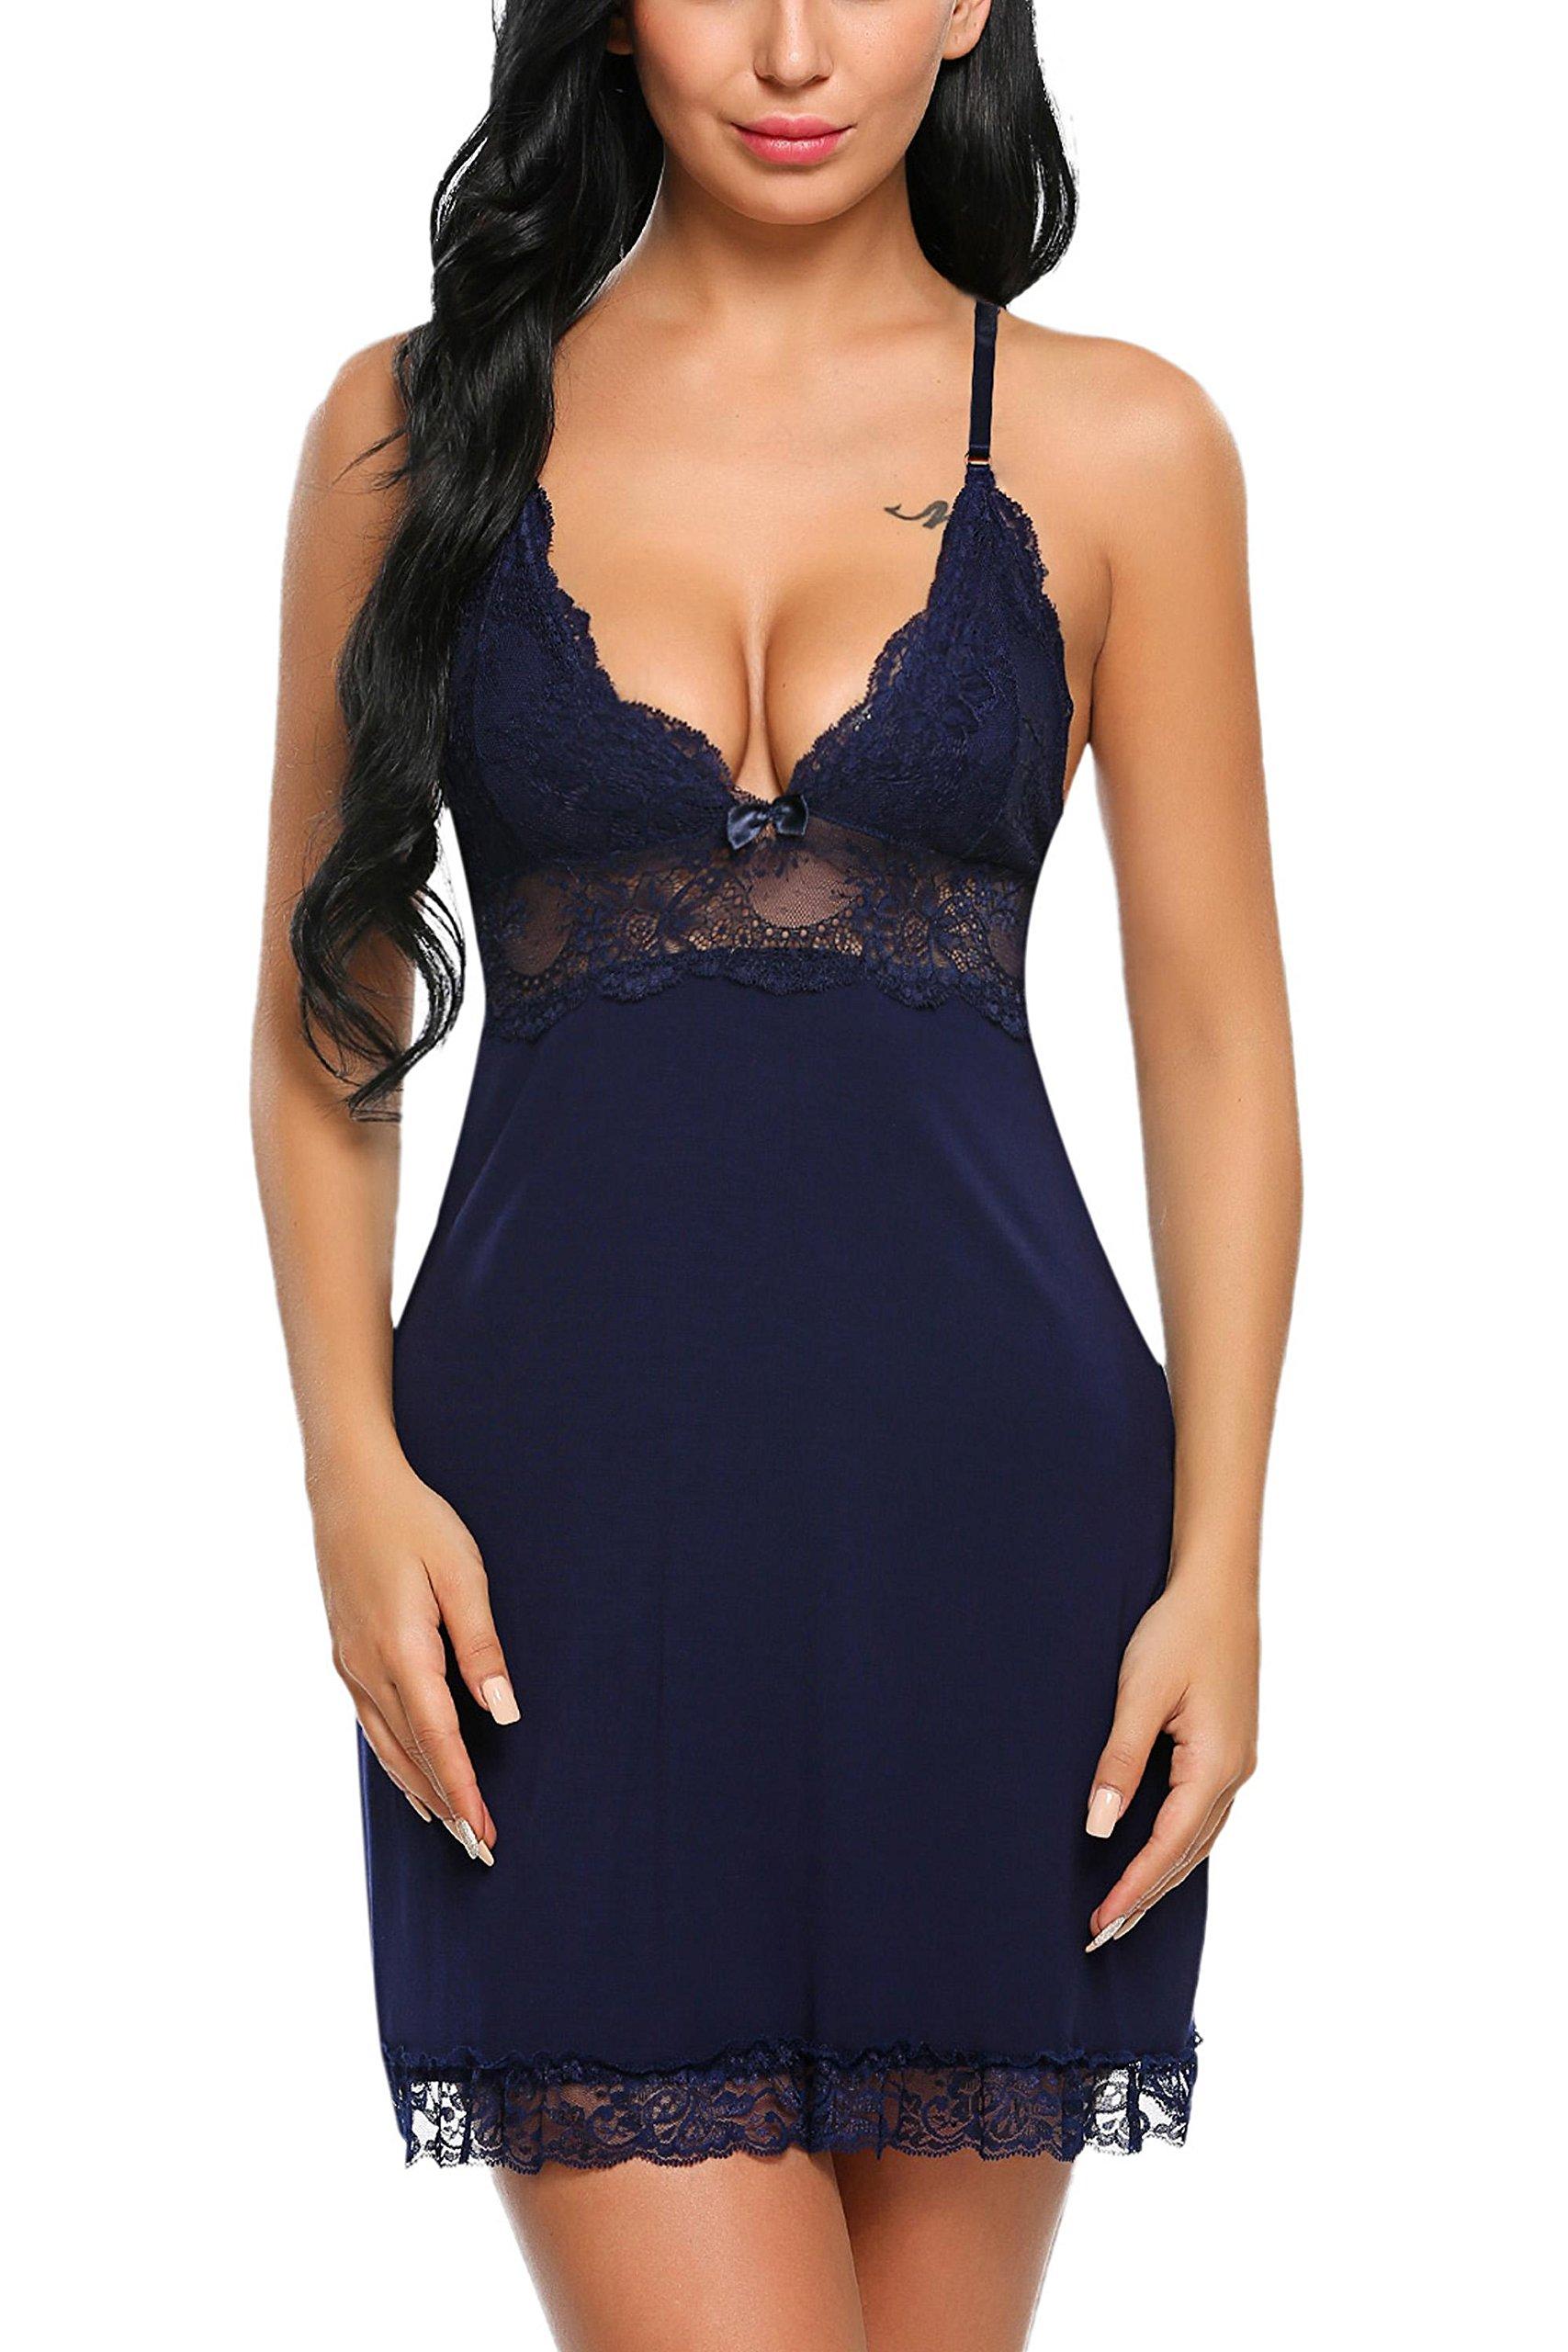 ADOME Women Sleepwear Lace Lingerie Halter Chemise Sexy Babydoll Full Slips Navy Blue XL